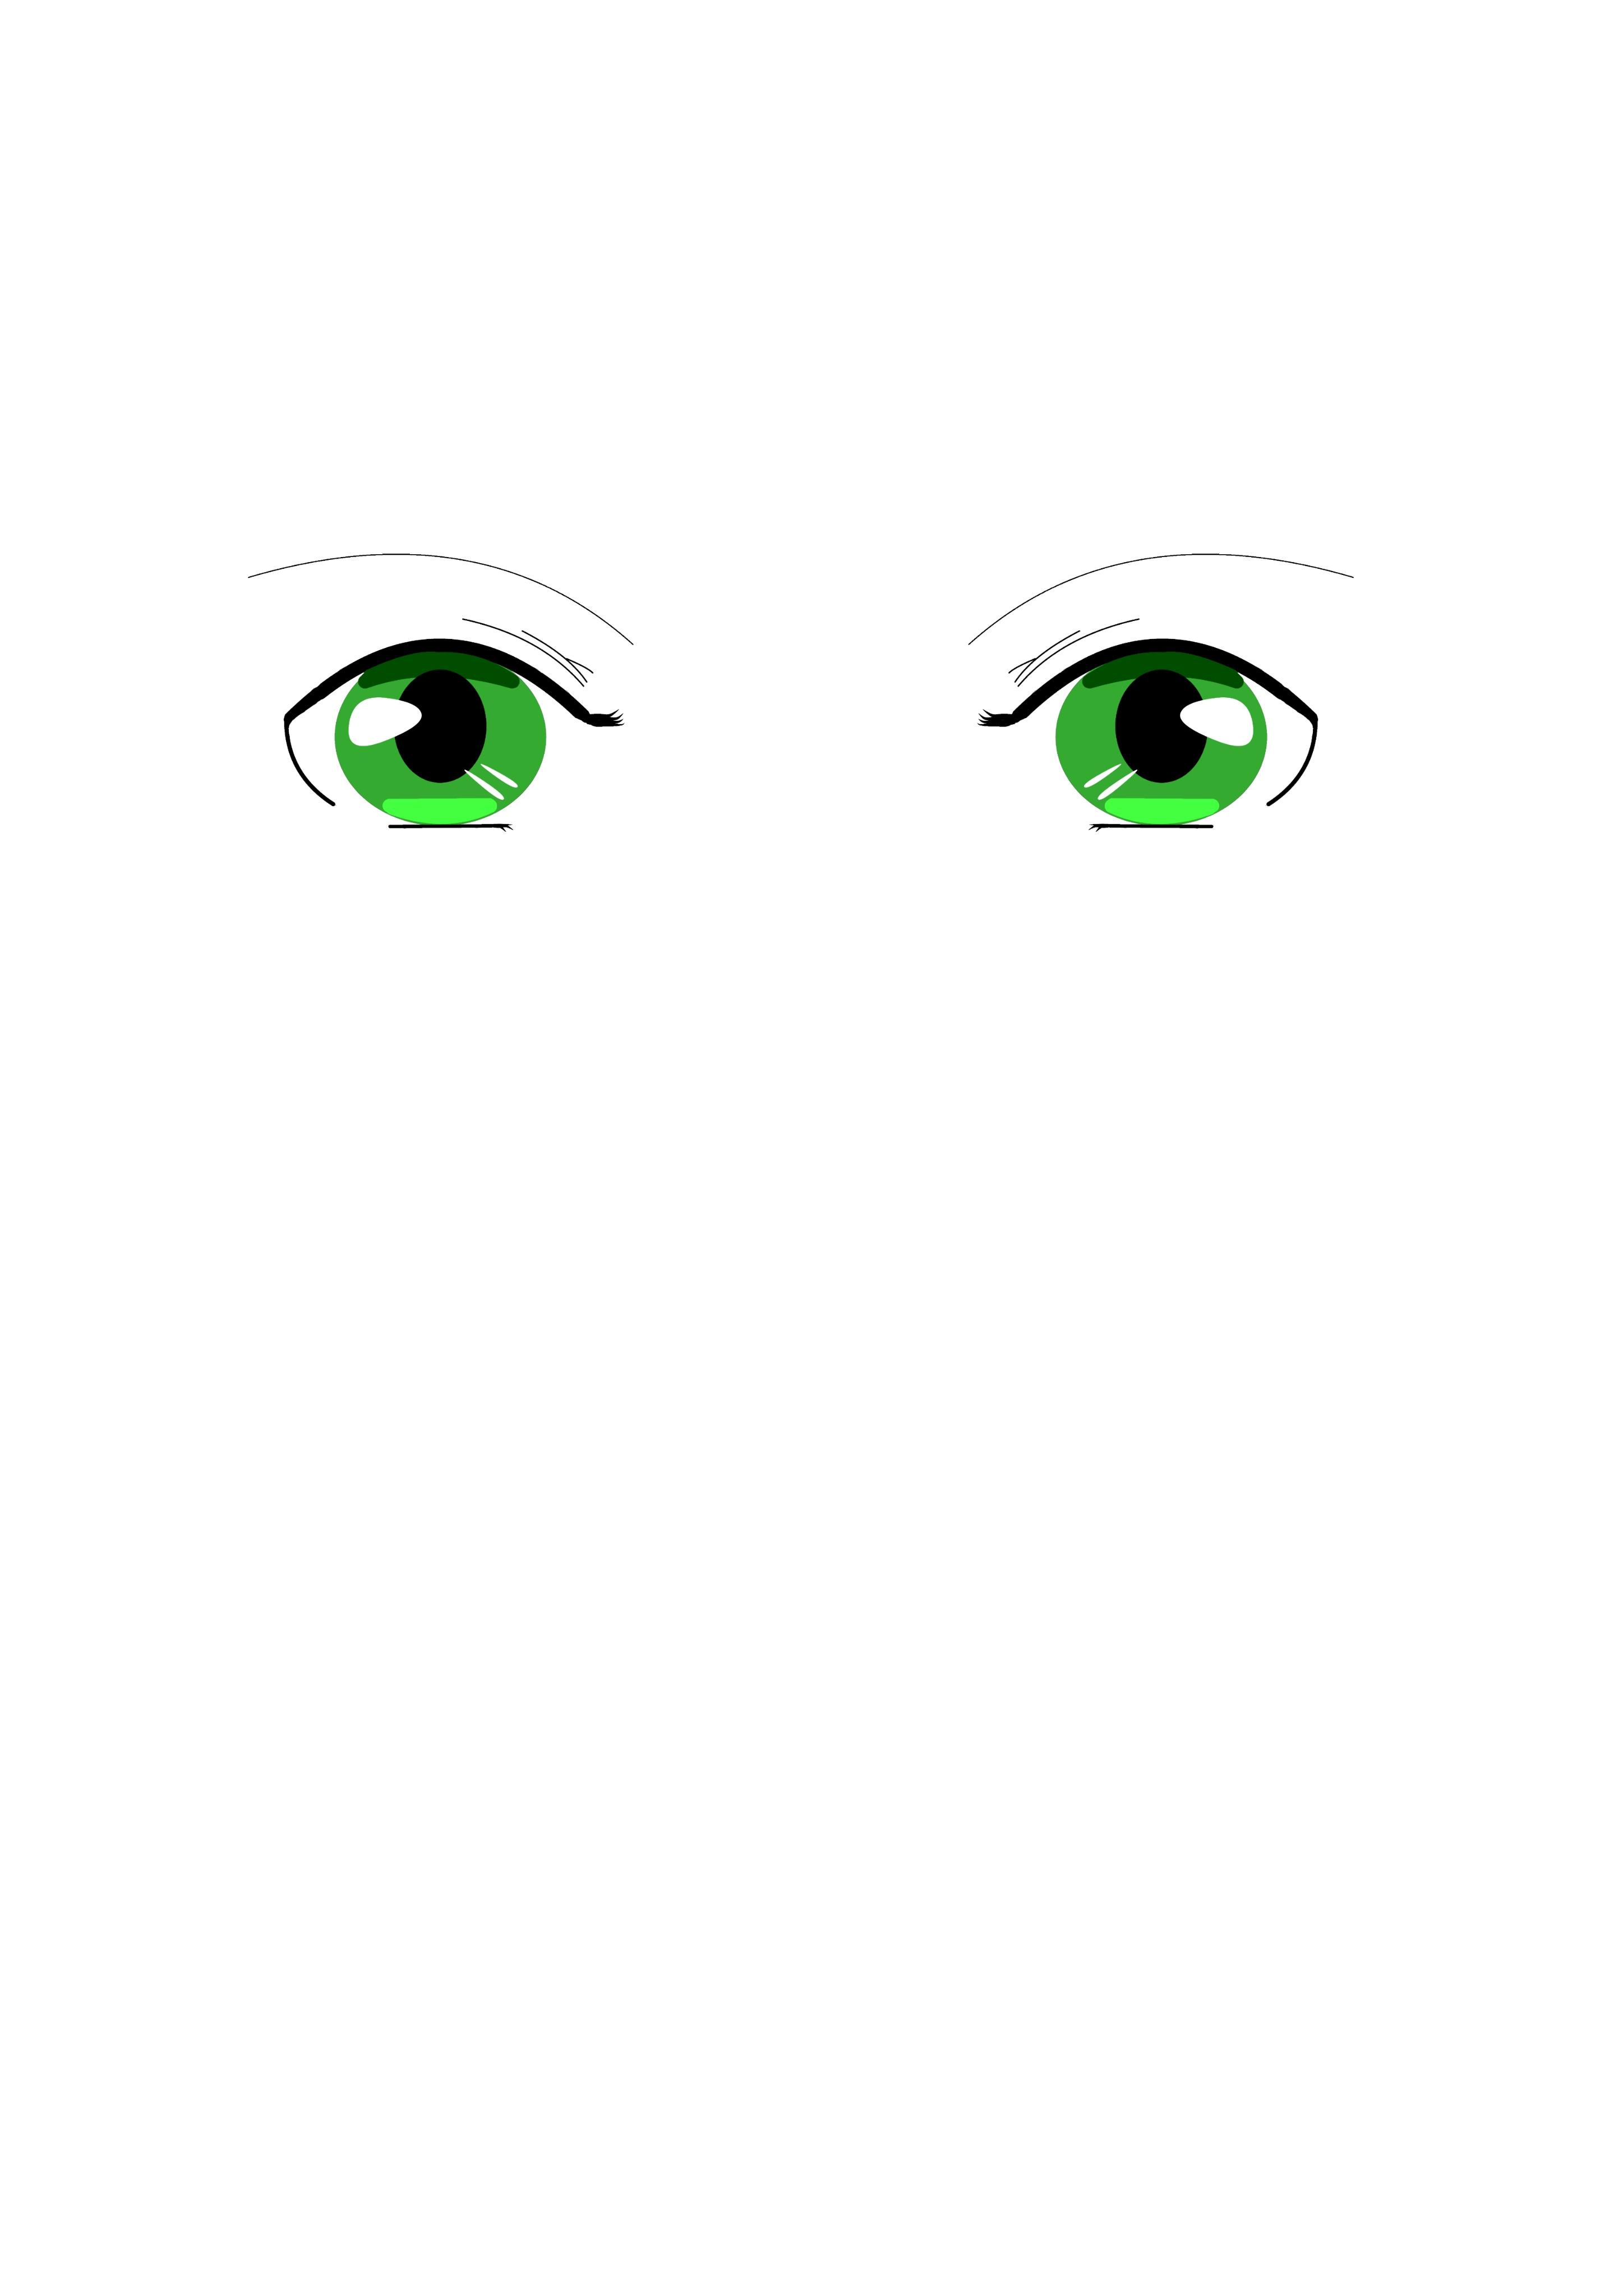 Manga Eyes v8.0